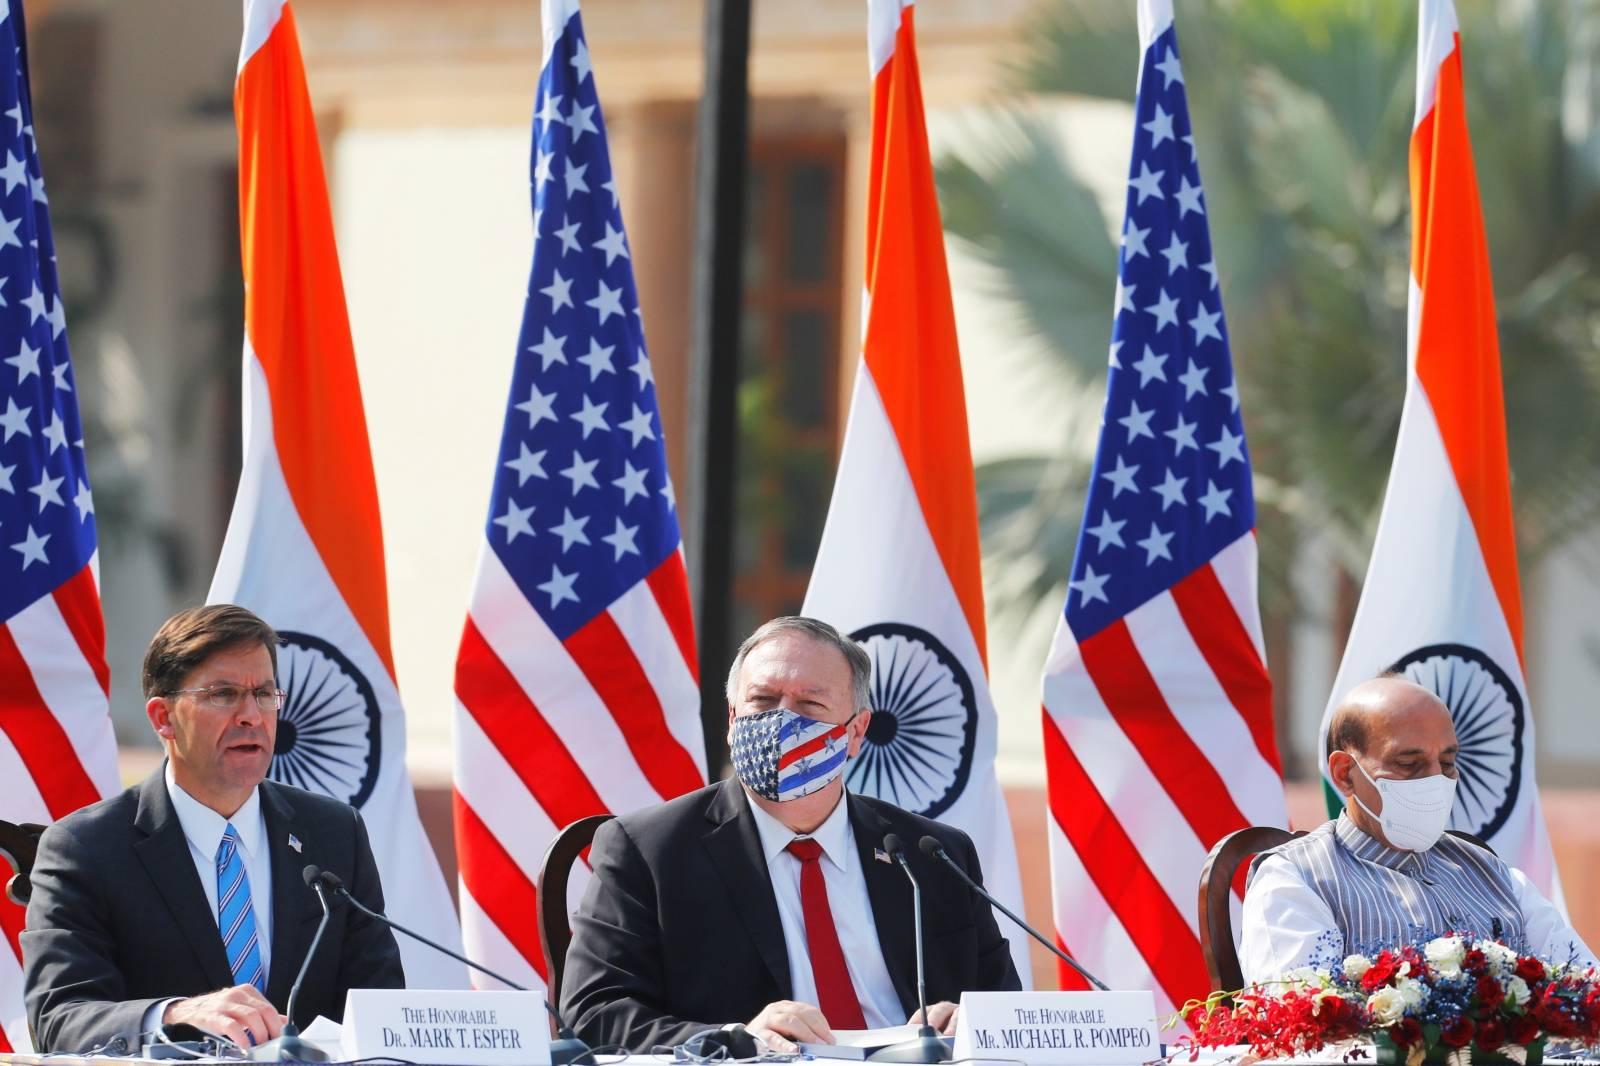 U.S. Secretary of State of Mike Pompeo and U.S. Defense Secretary Mark Esper visit India